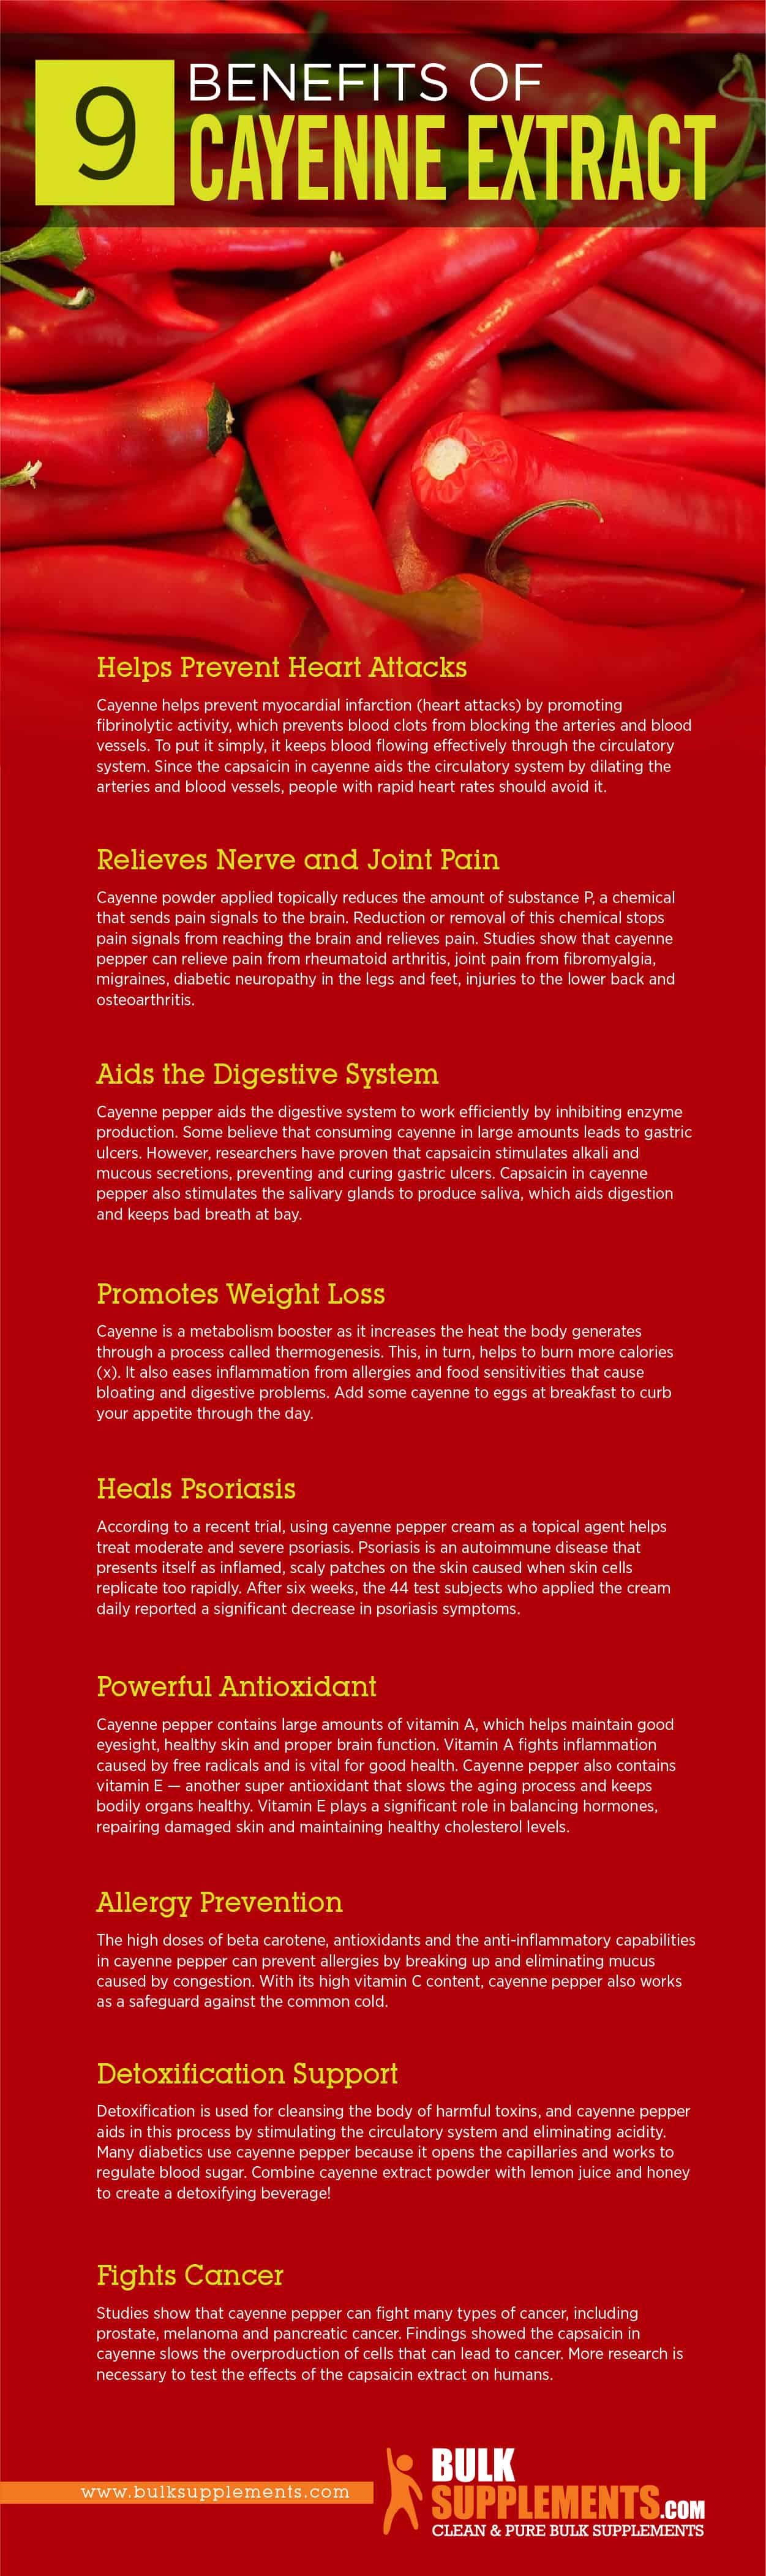 Cayenne Extract Benefits